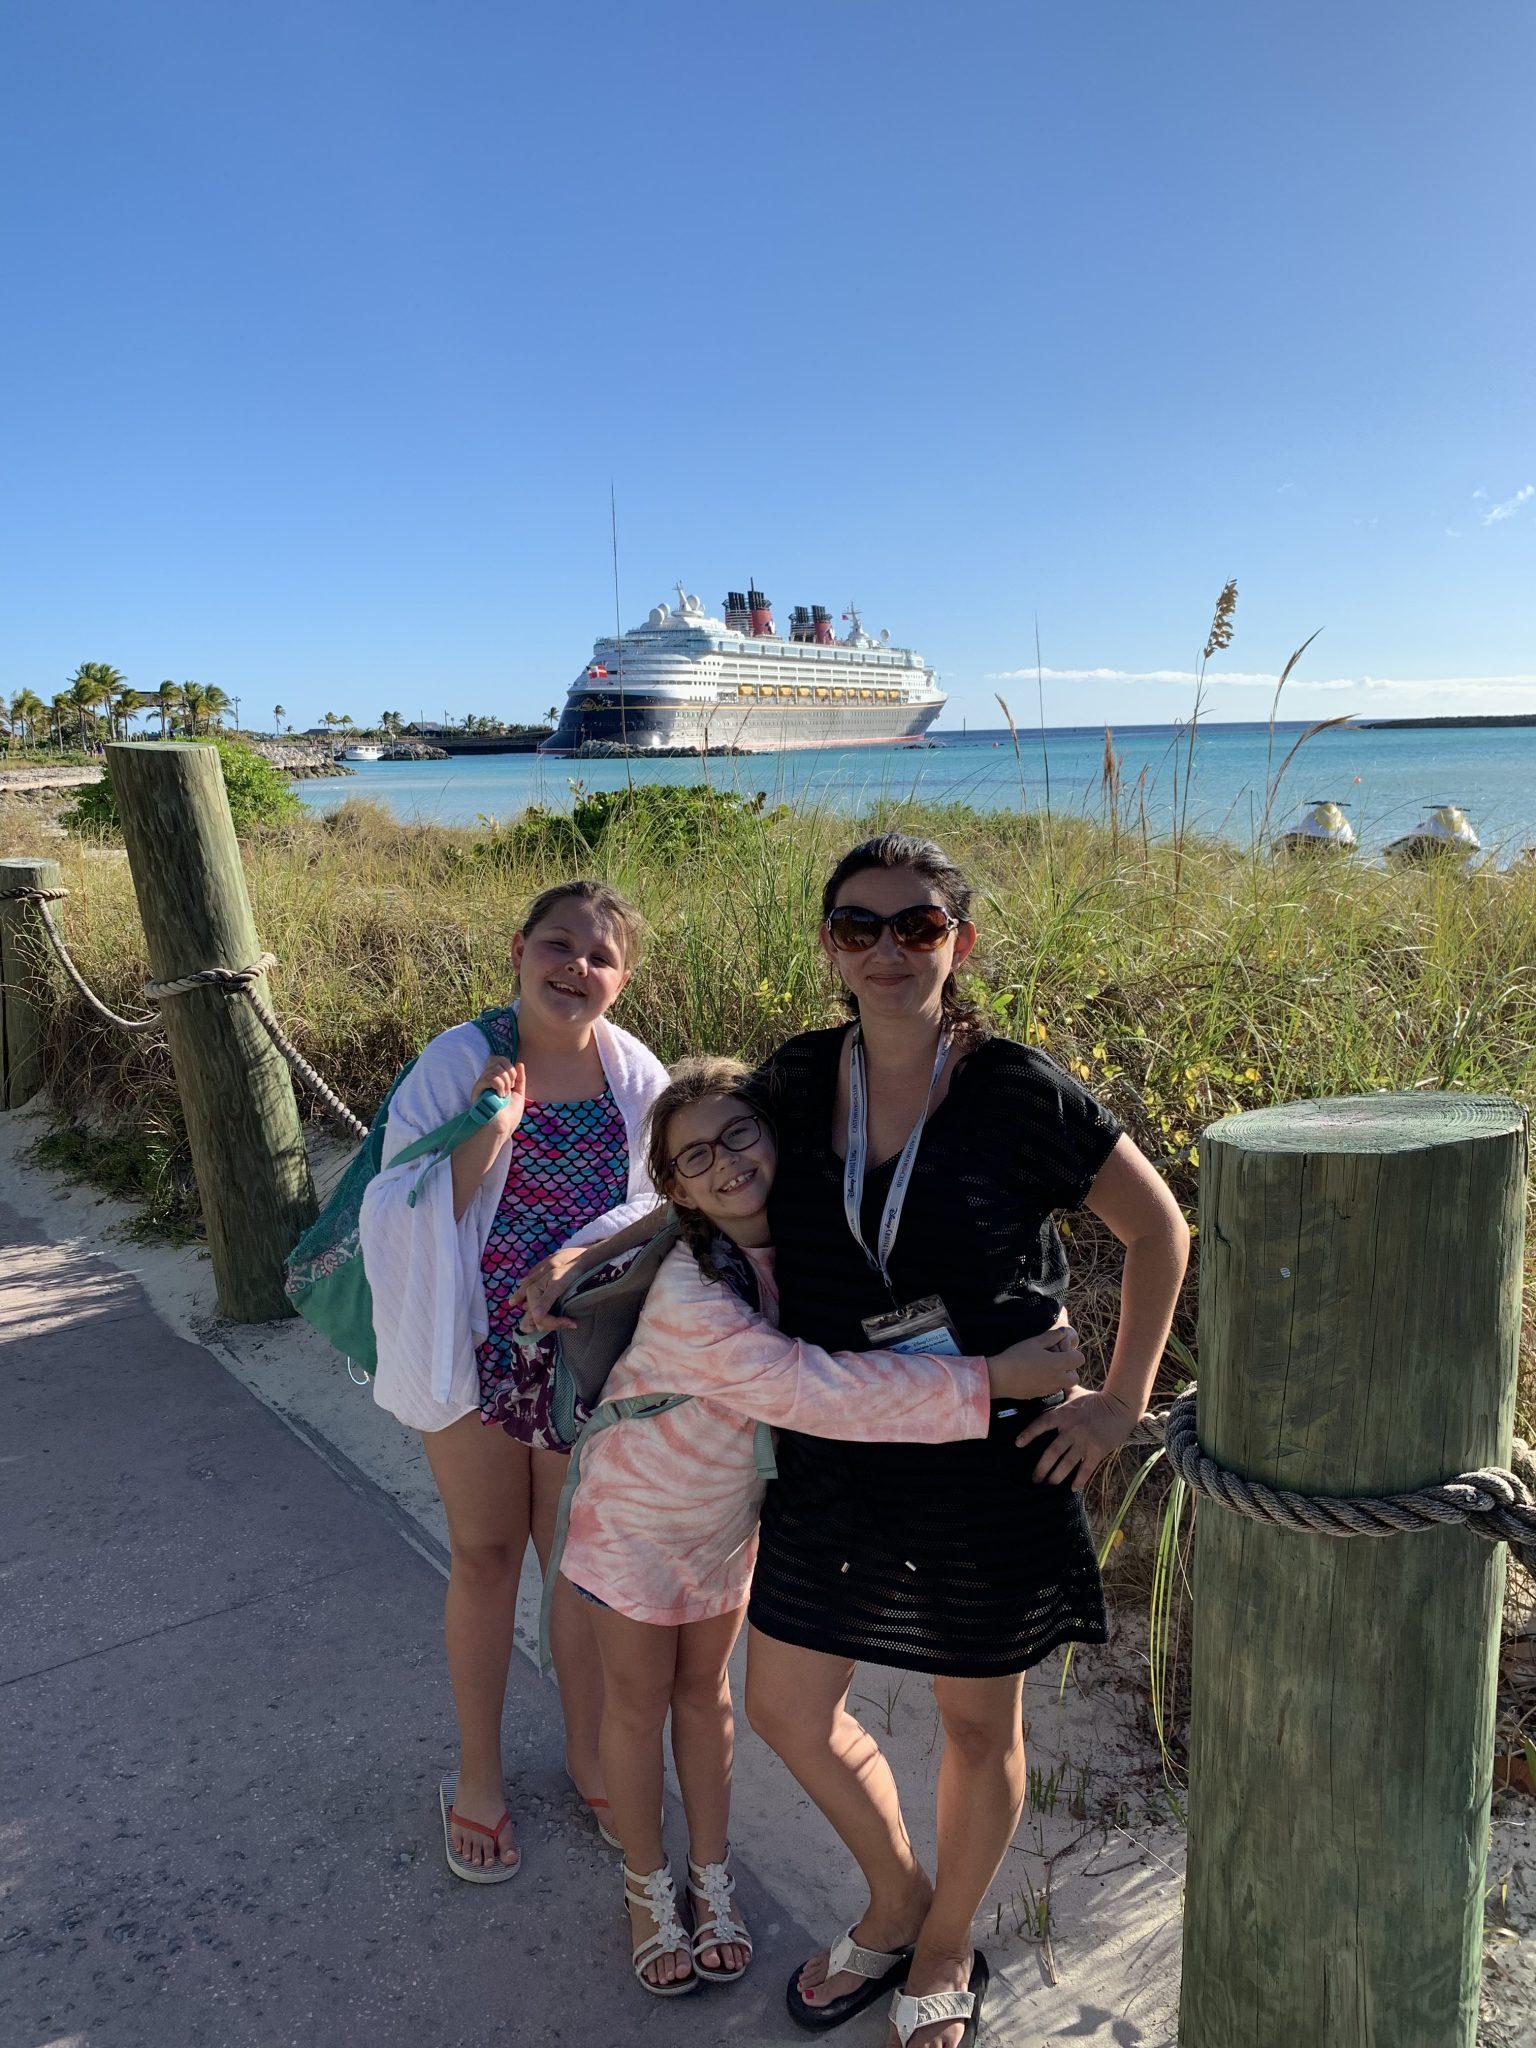 Disney Wonder on Castaway Cay